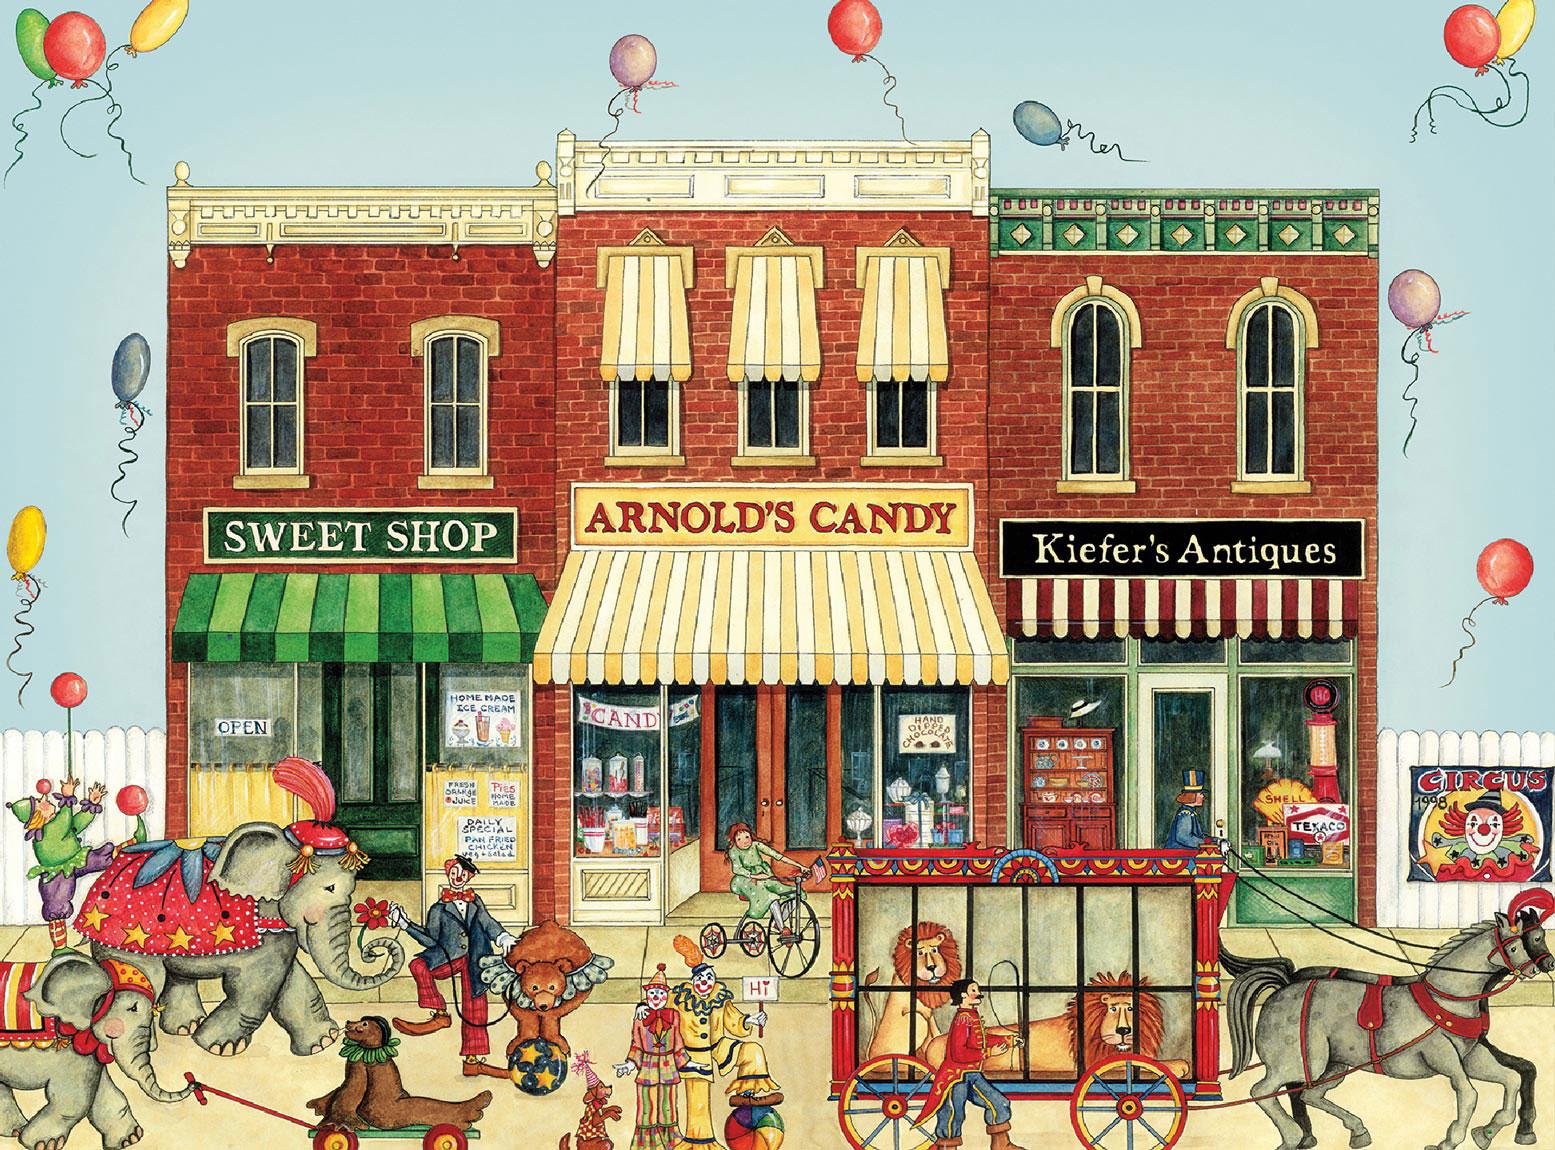 Circus Parade (Ellen Stouffer) - Scratch and Dent Animals Jigsaw Puzzle